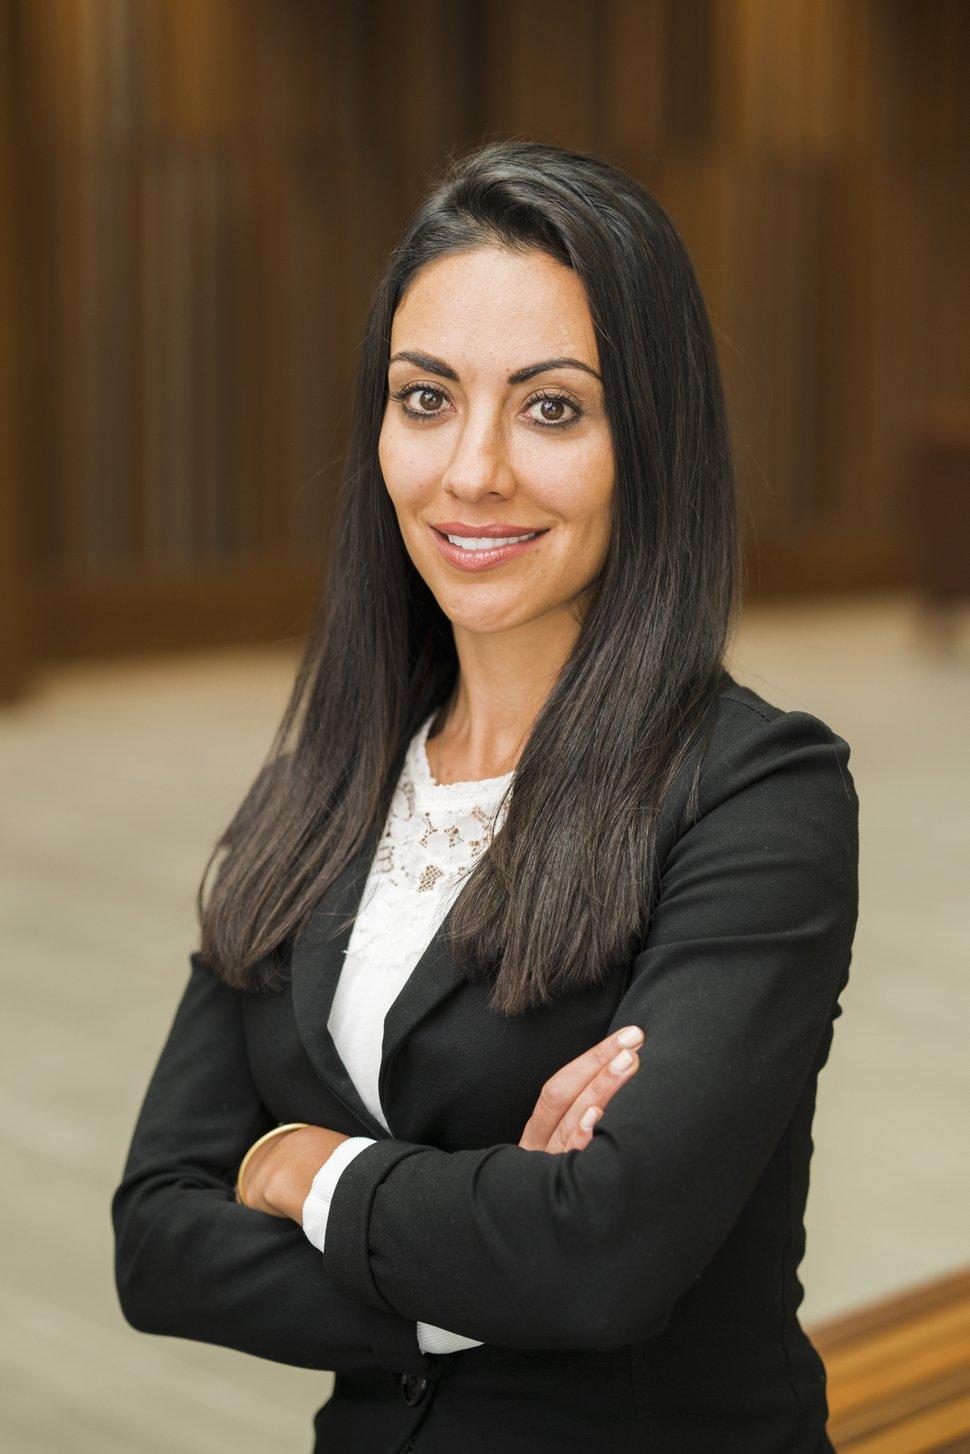 Shima Baradaran Baughman | The University of Utah